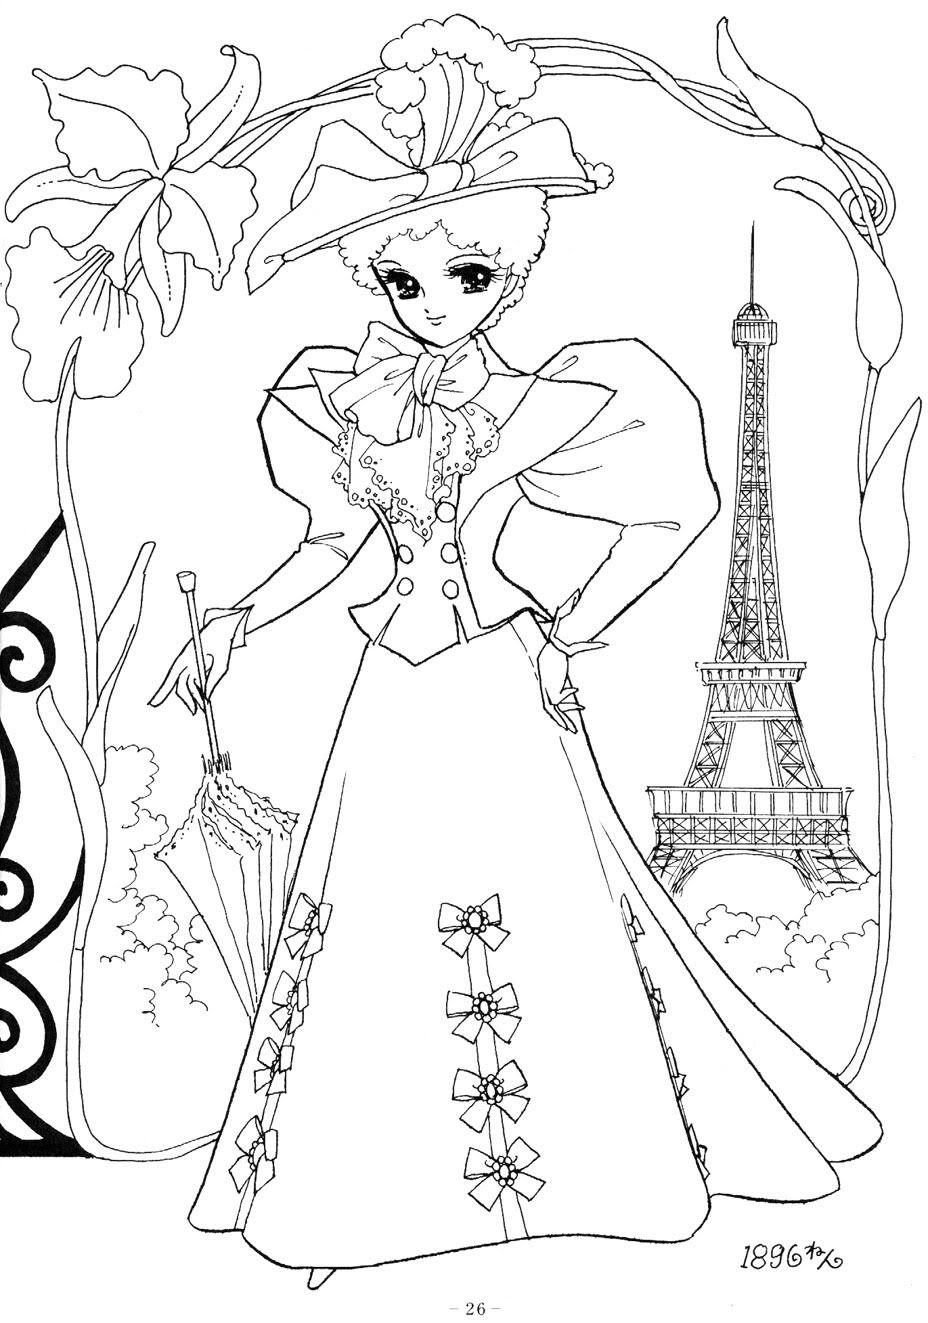 Ladies in historical costume: 1896, Princess World, shoujo princess ...